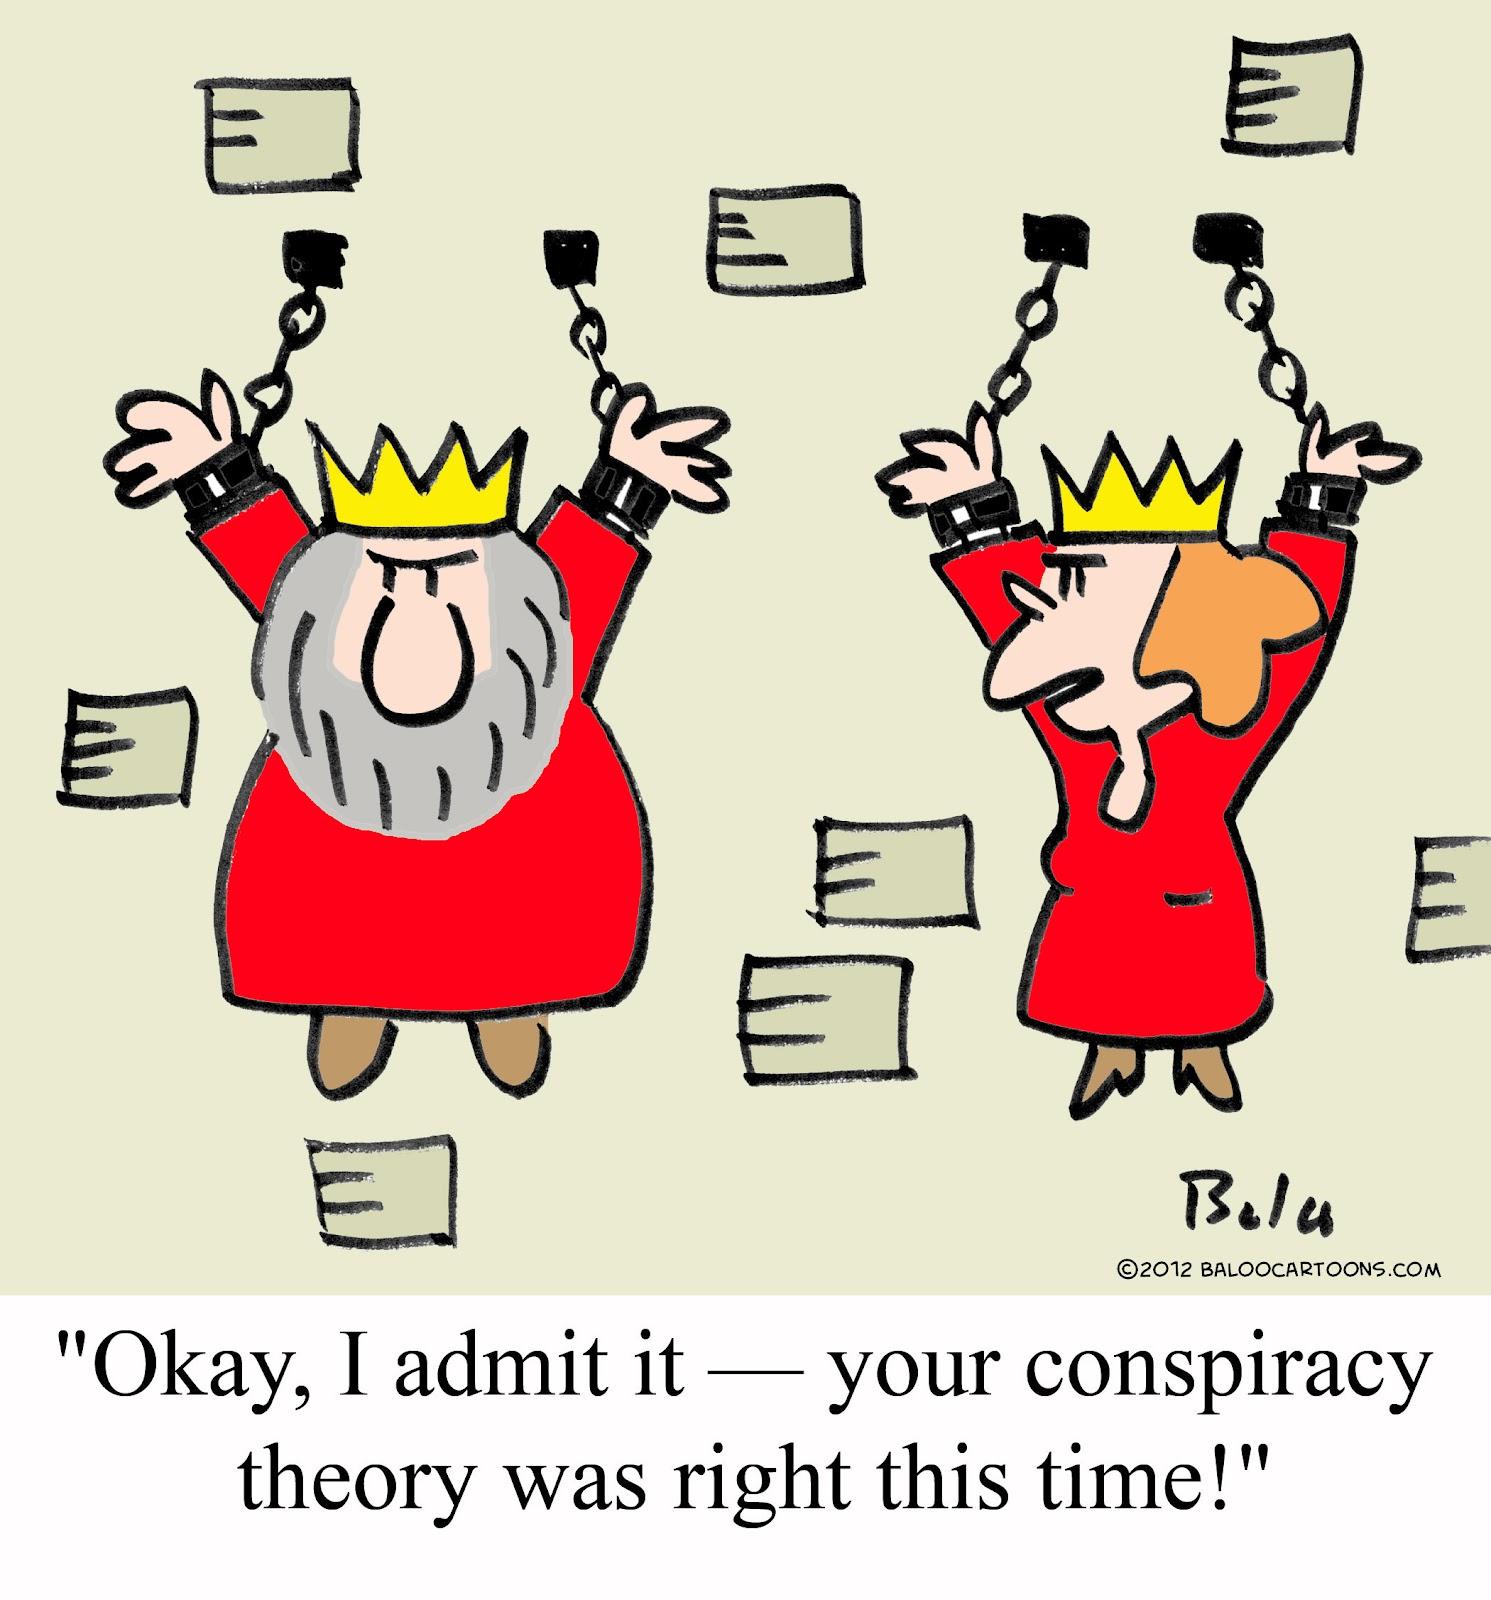 Baloos Cartoon Blog King And Queen Cartoon